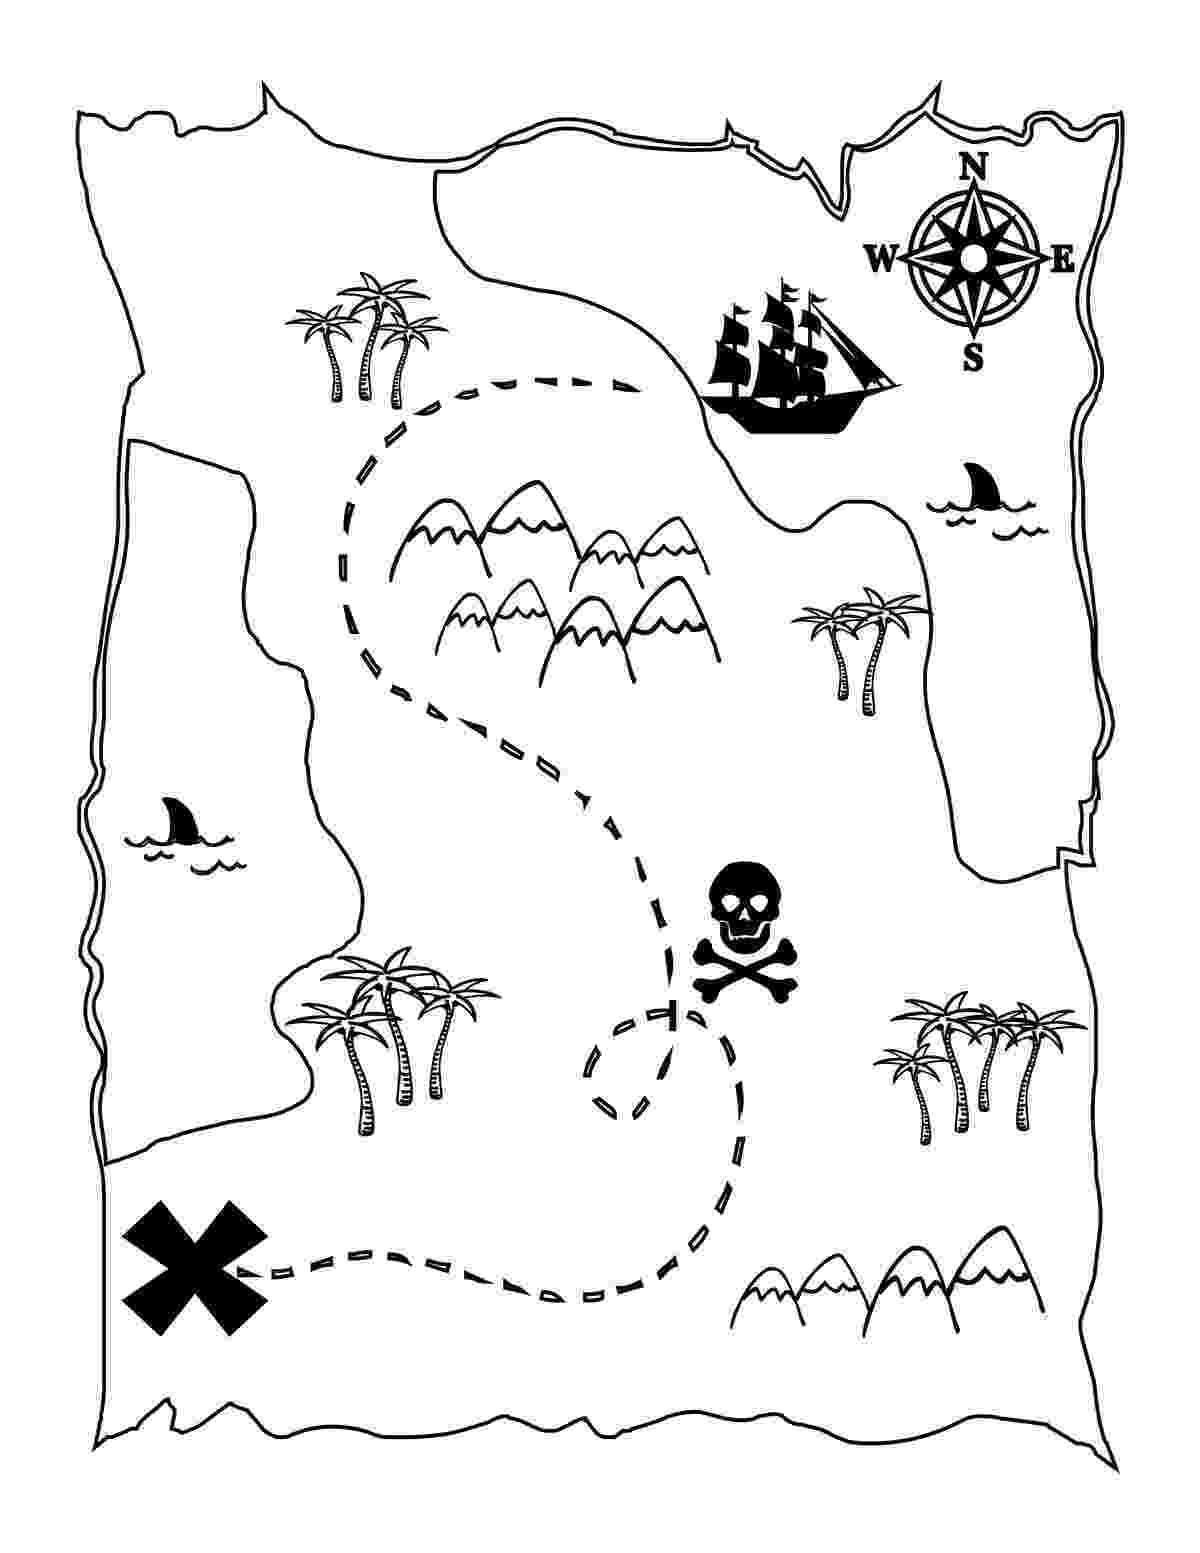 printable treasure map coloring page treasure map coloring pages for kids map treasure printable page coloring